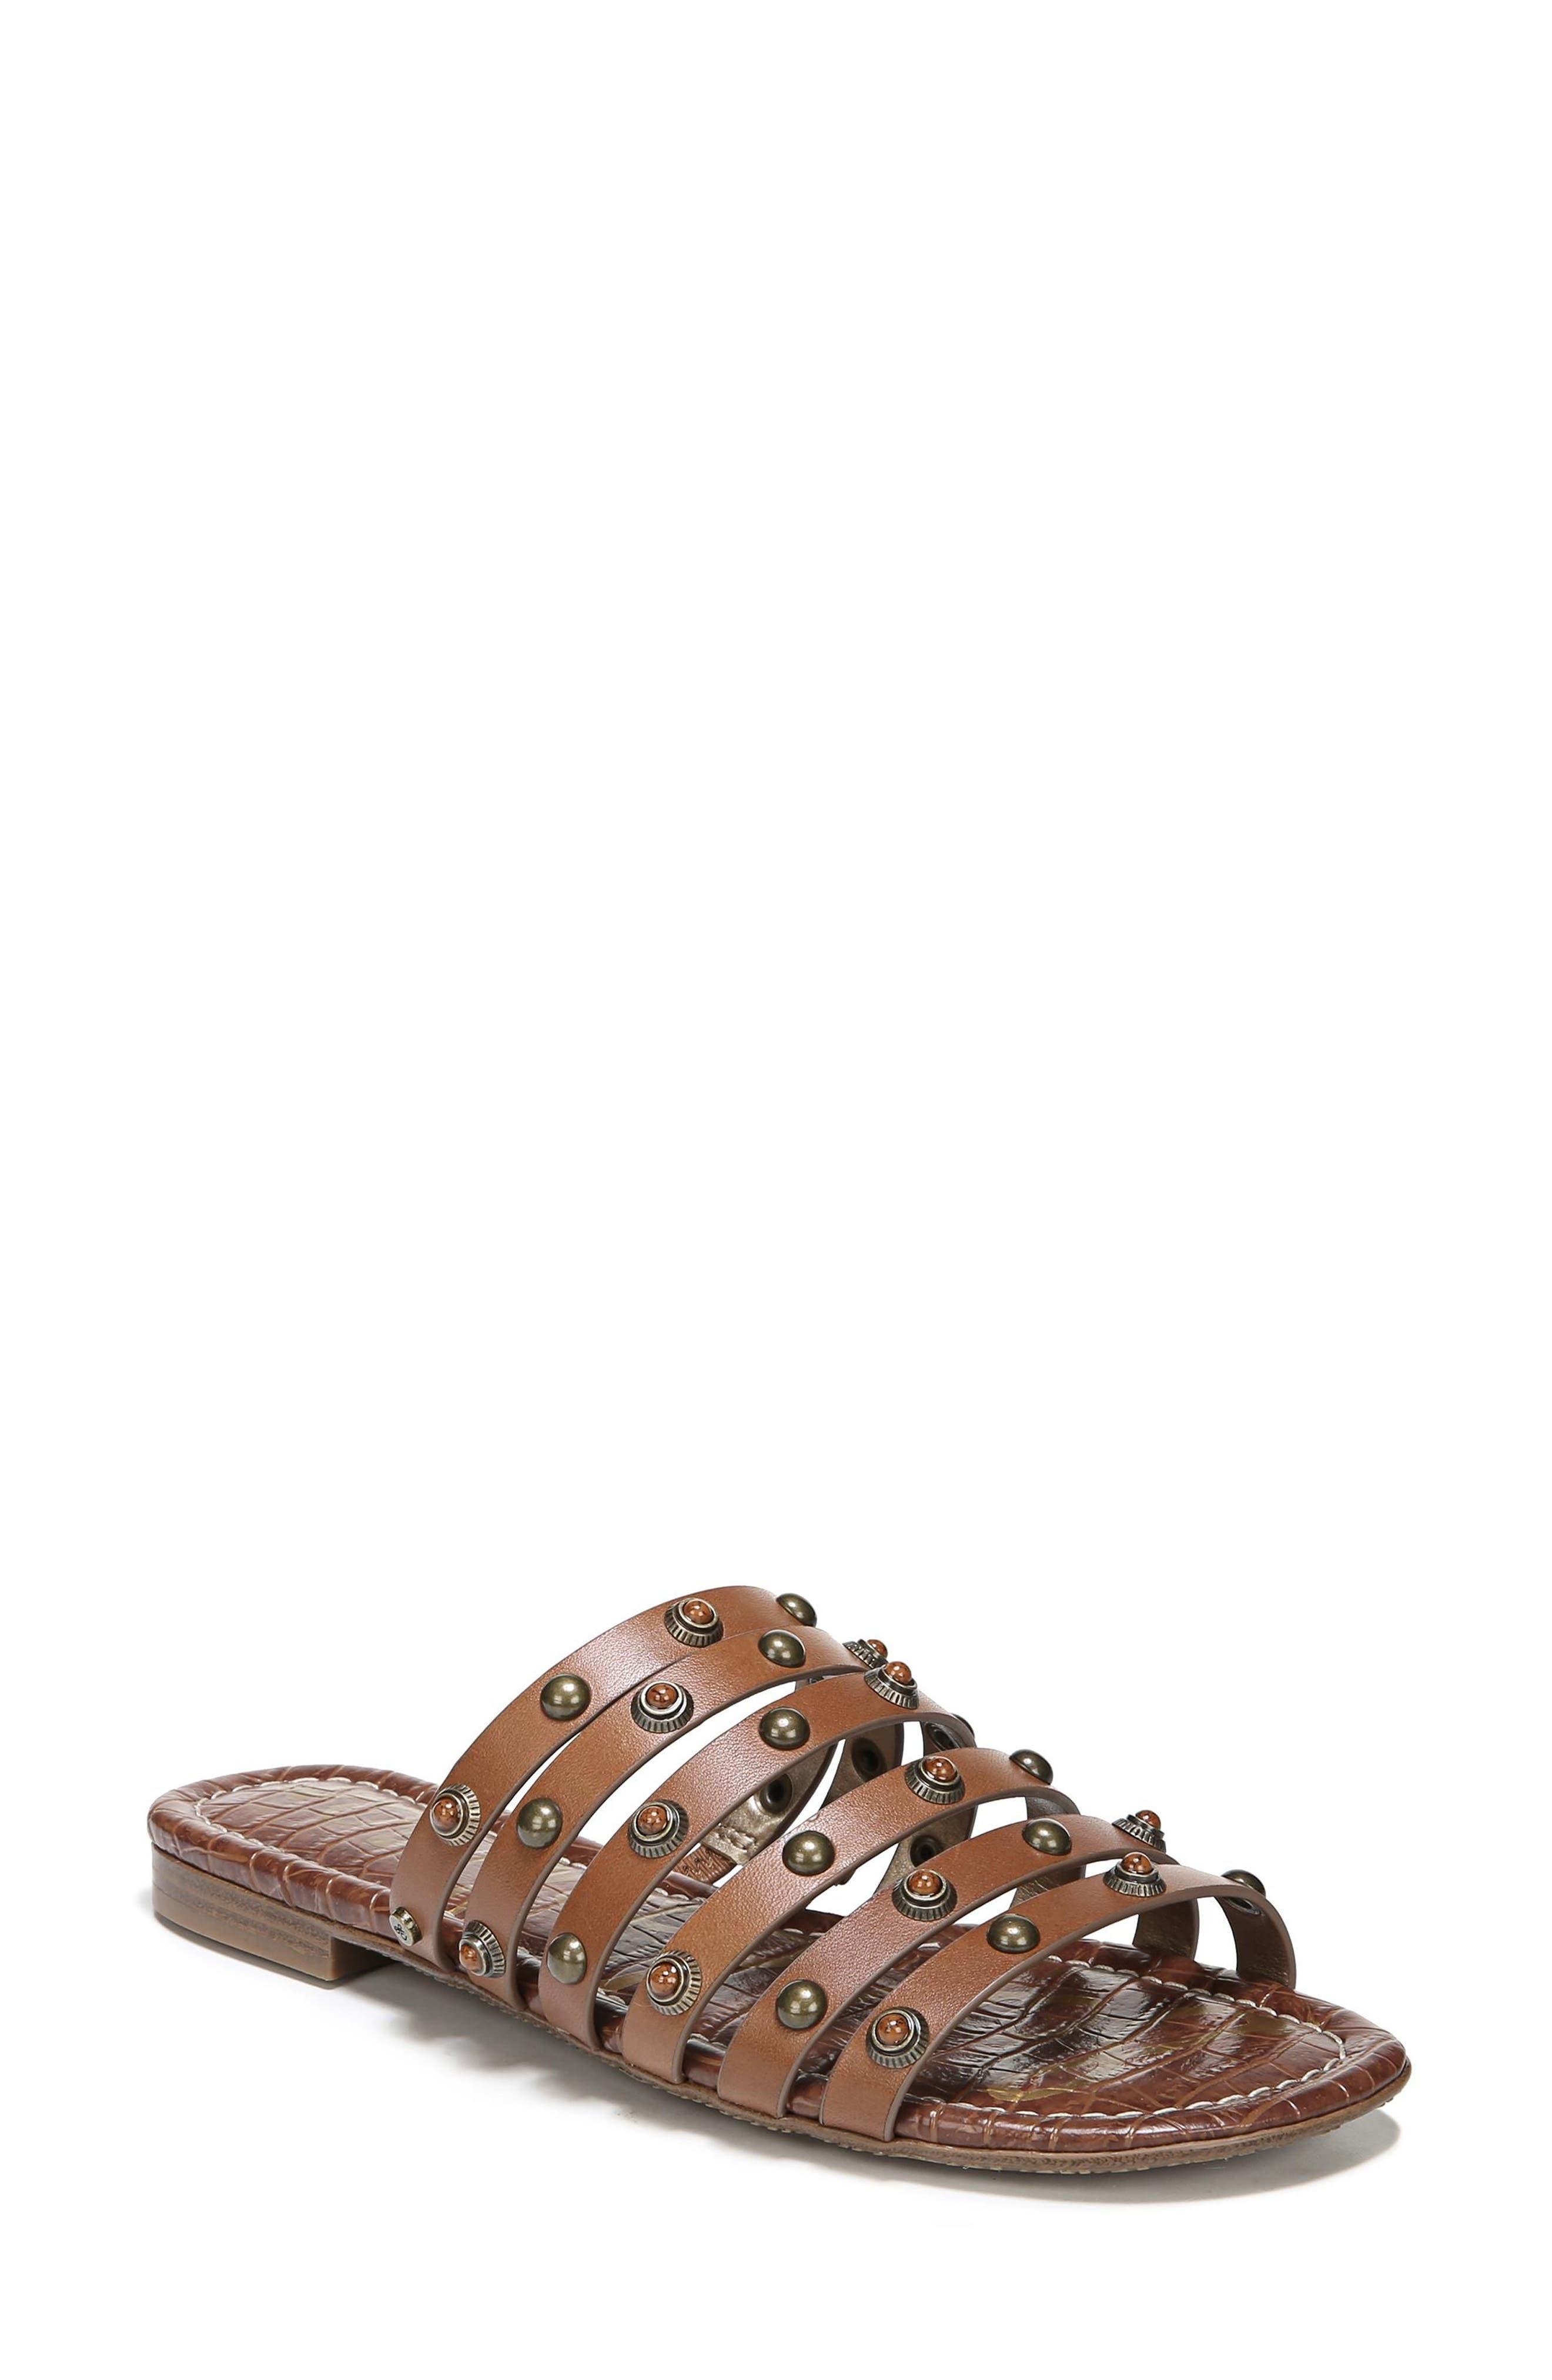 Brea Studded Slide Sandal,                             Main thumbnail 1, color,                             Luggage Leather